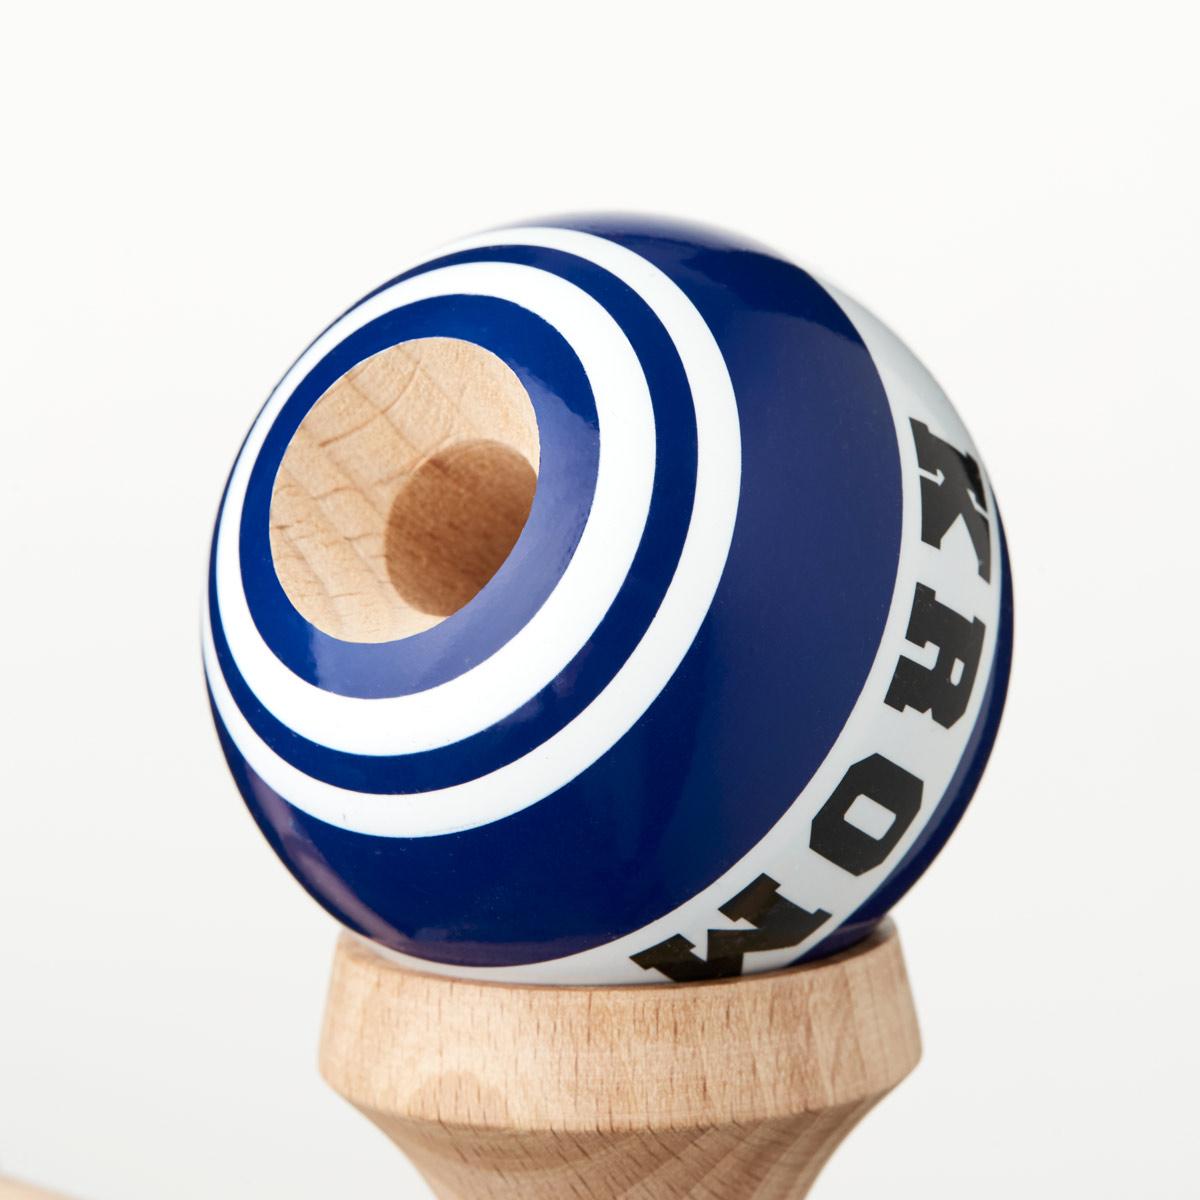 KROM - STROGO W.I.P. BLUE-COLLAR